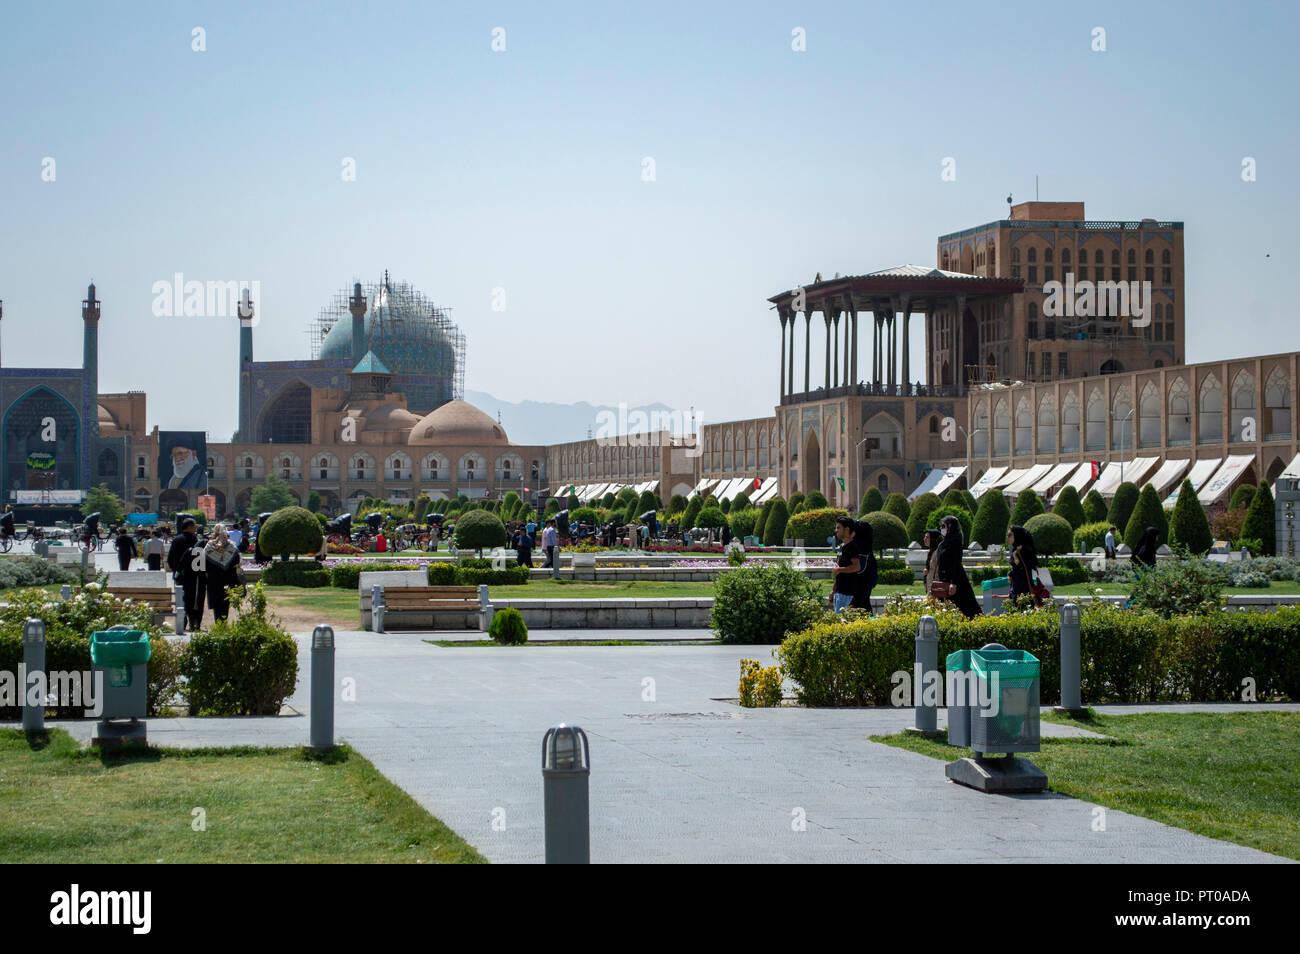 Imam Square in Isfahan, Iran Stock Photo